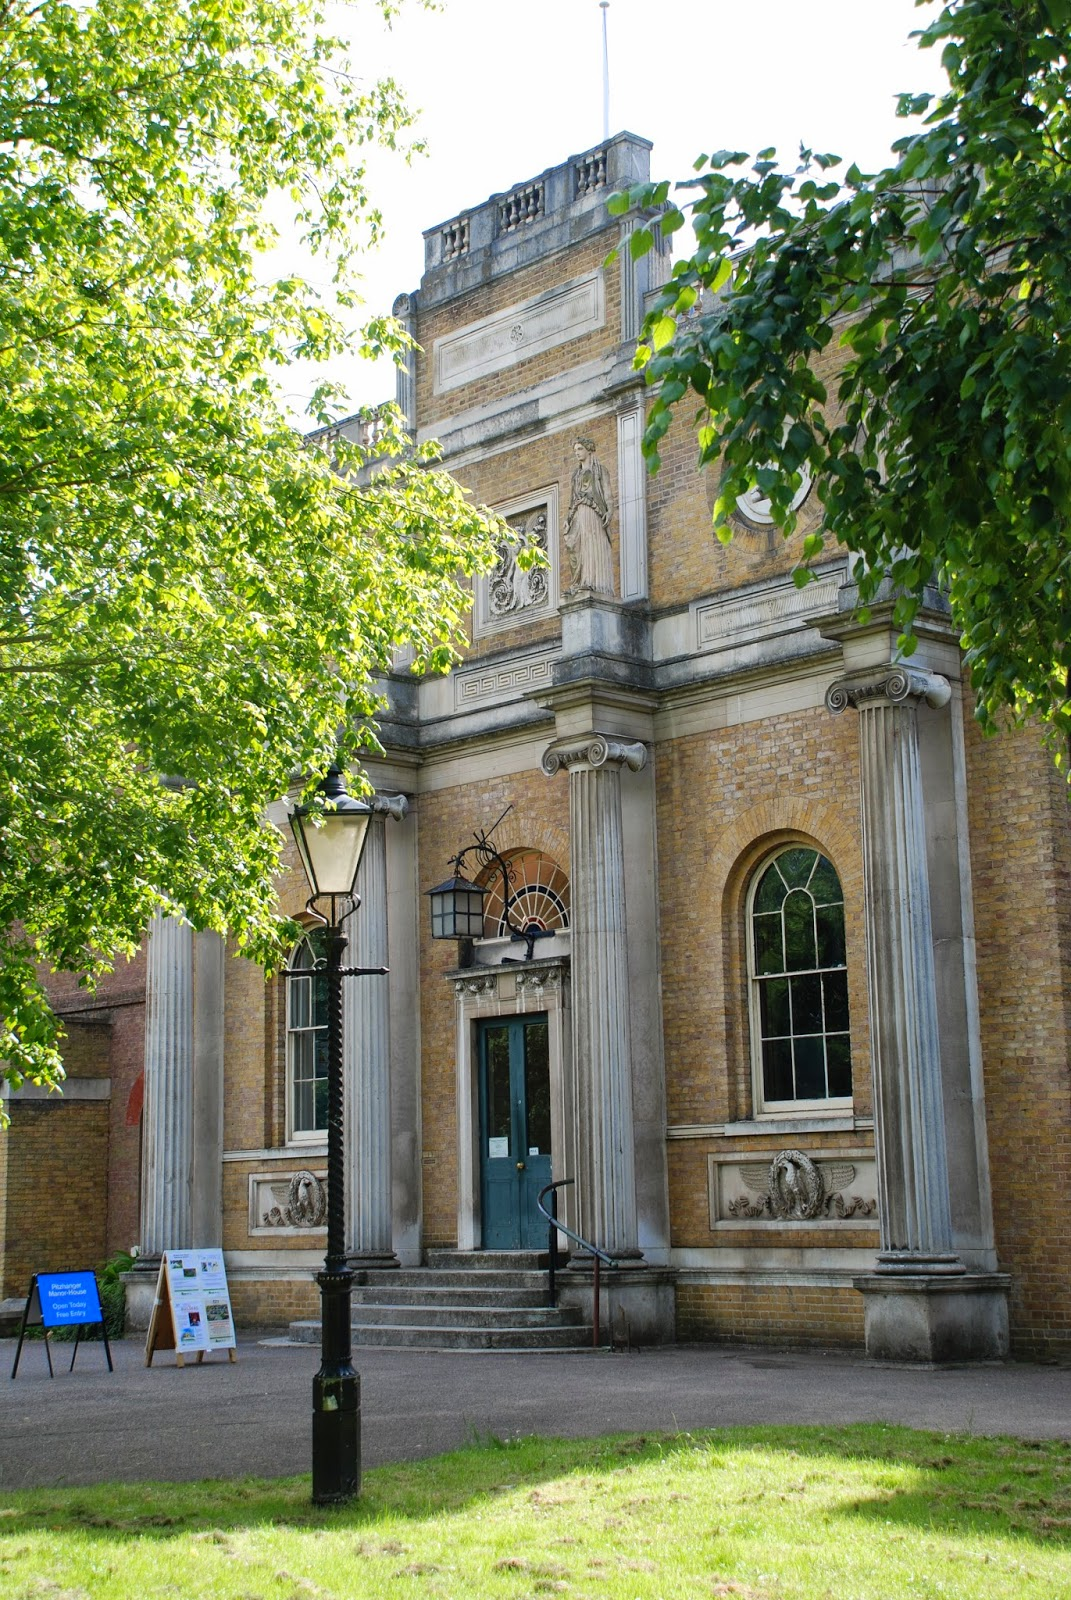 Pitshanger Manor,Walpole Park, Ealing, London